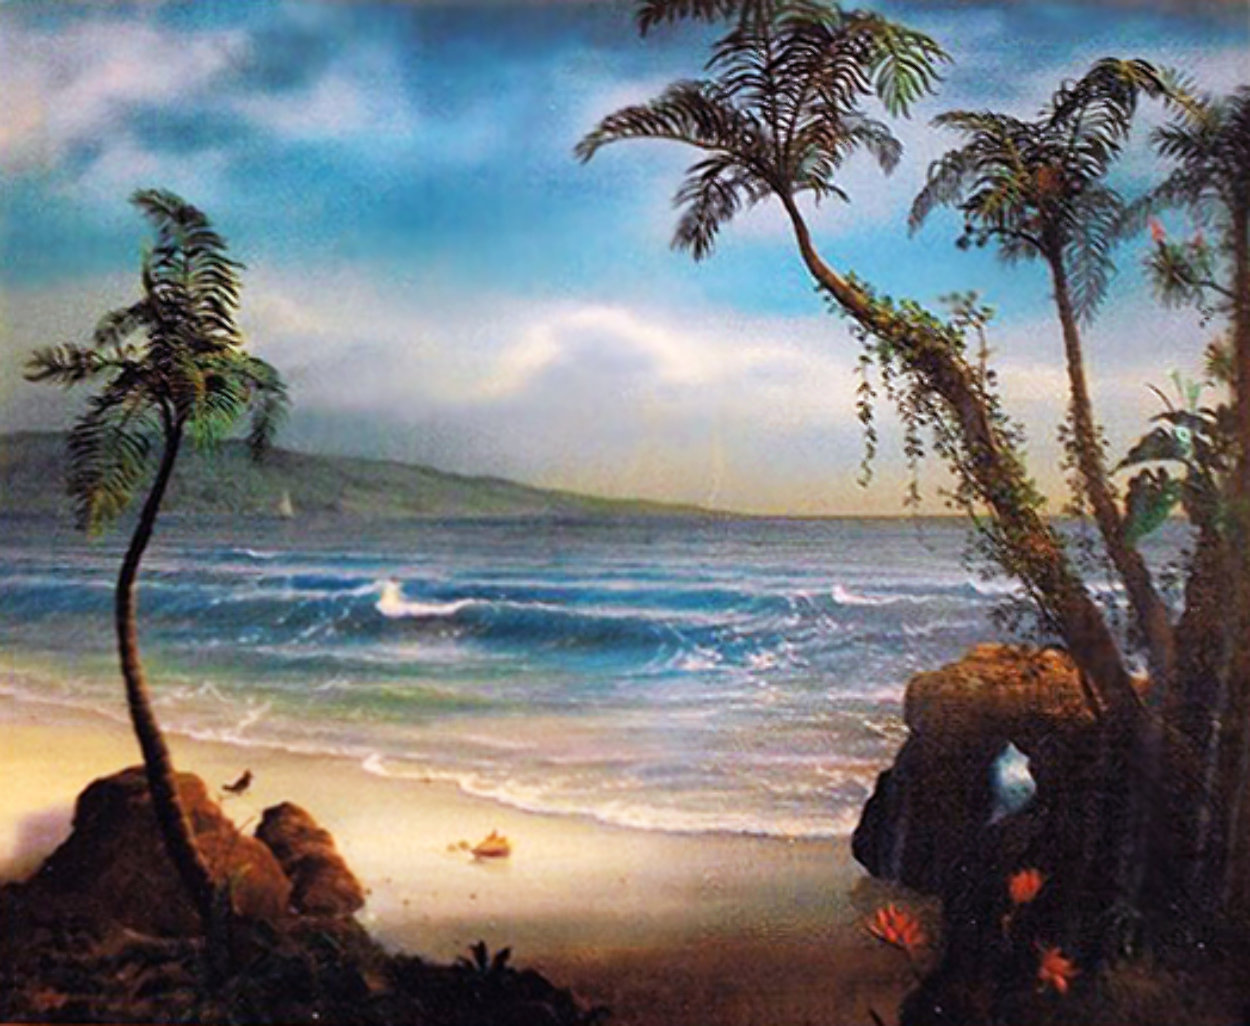 Stranger in Paradise 1984 16x20 Original Painting by Loren D Adams